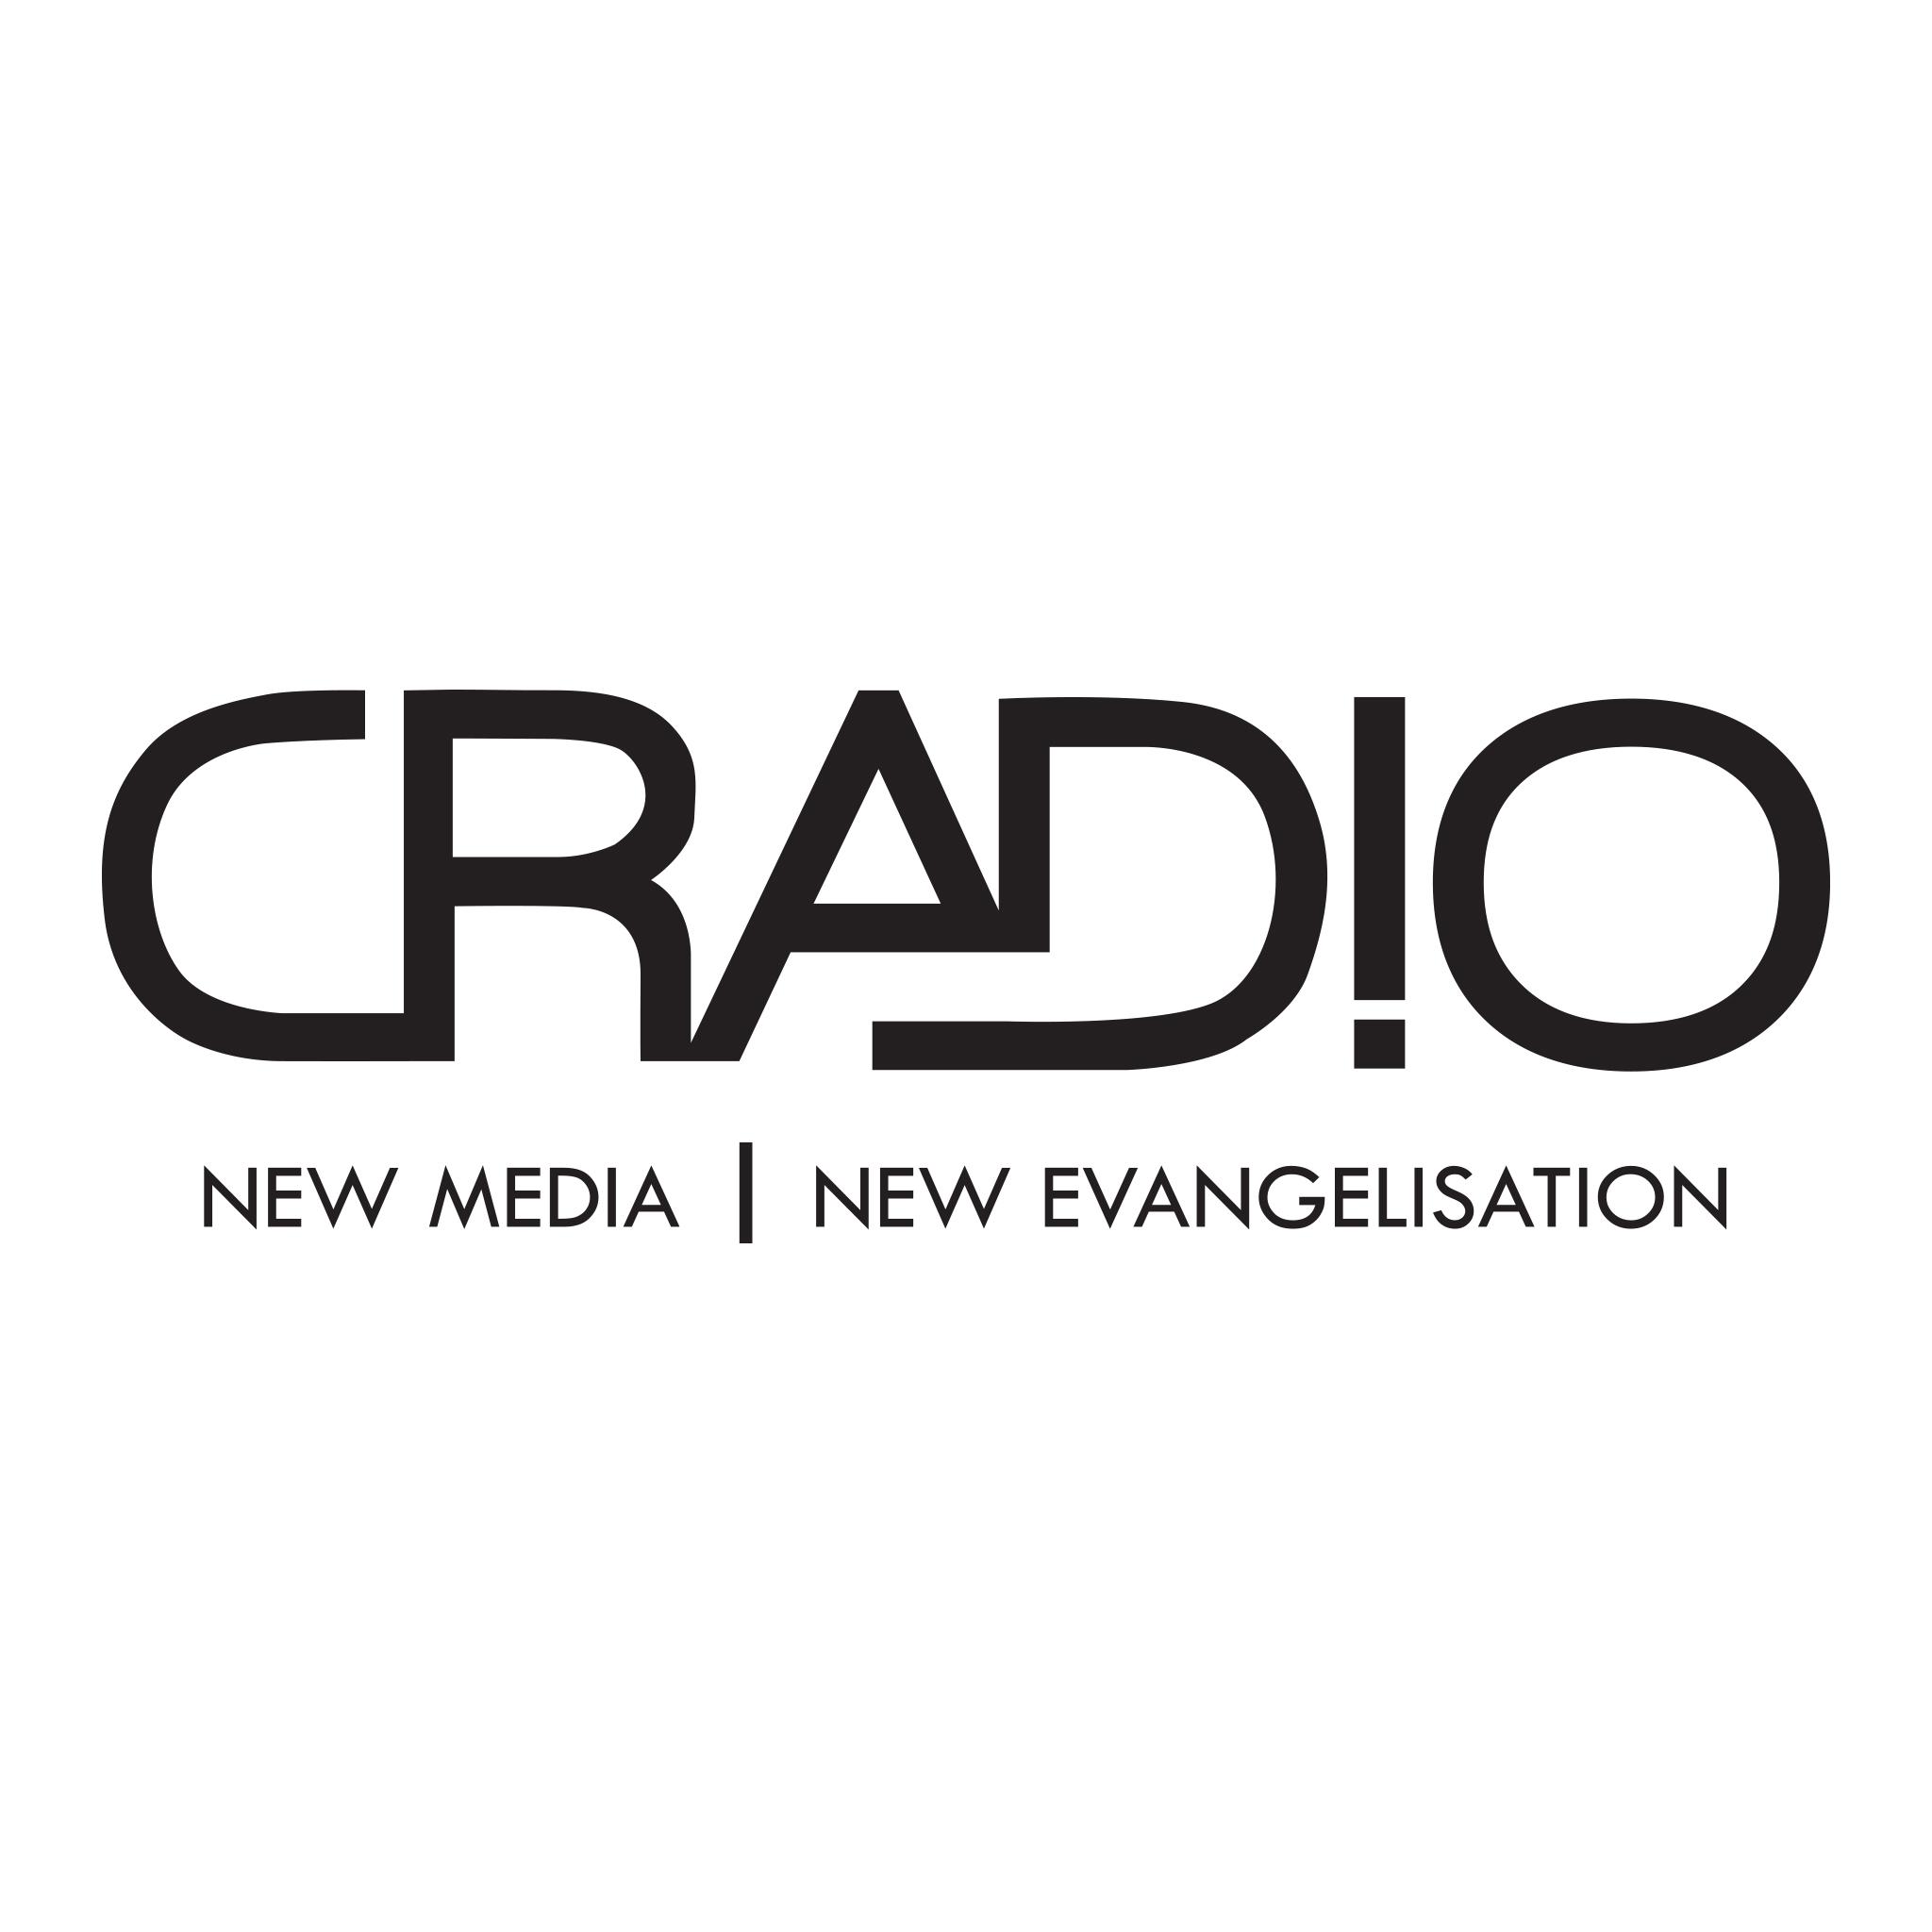 Cradio